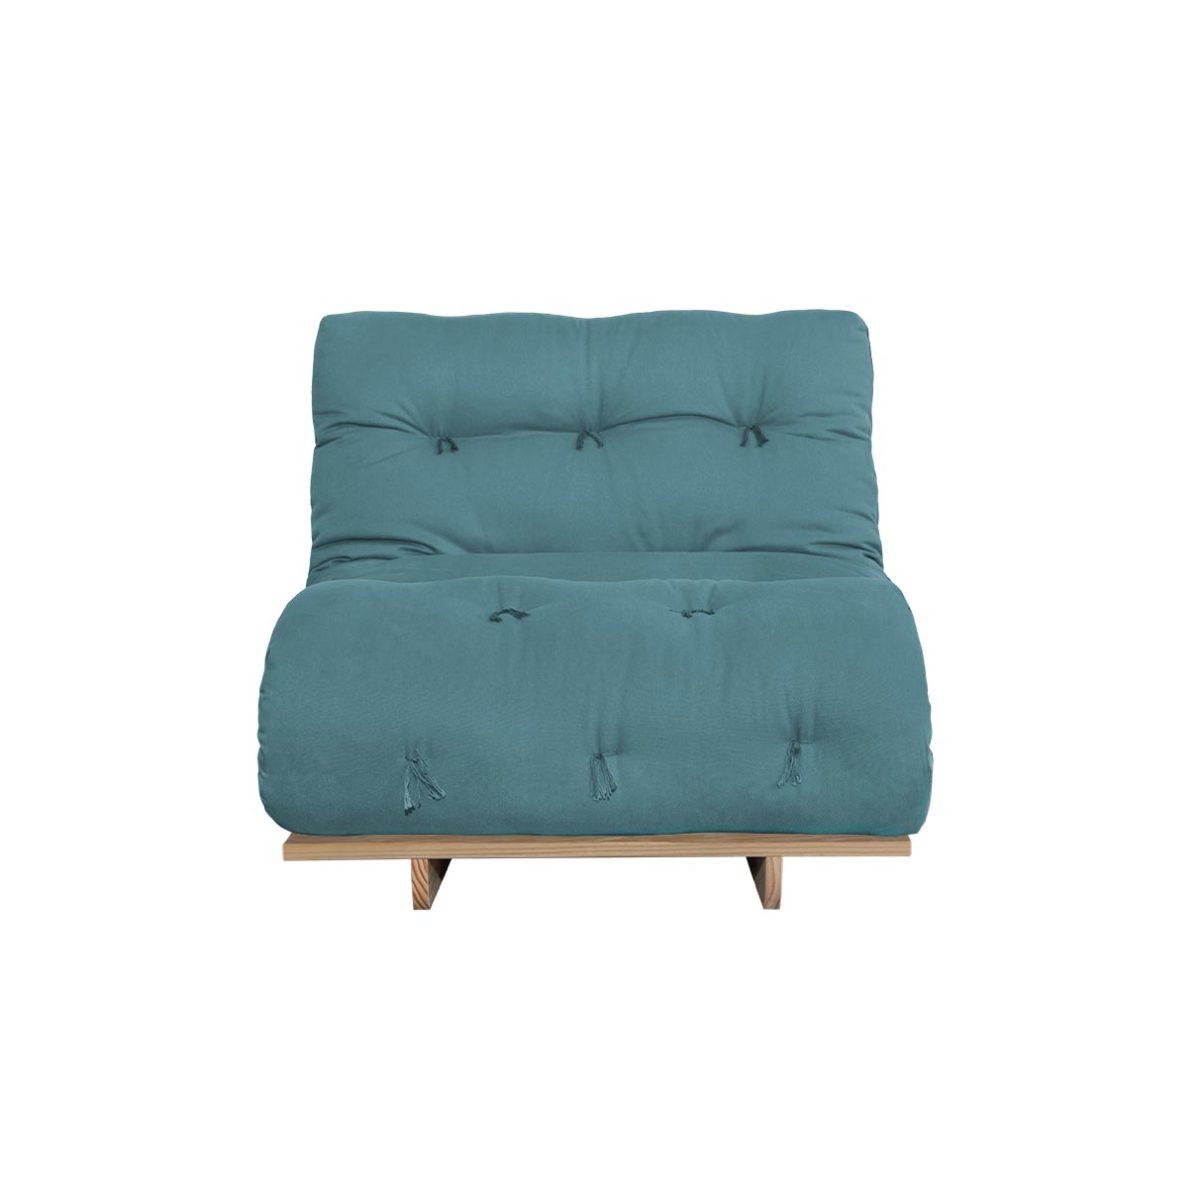 poltrona cama individual futon company